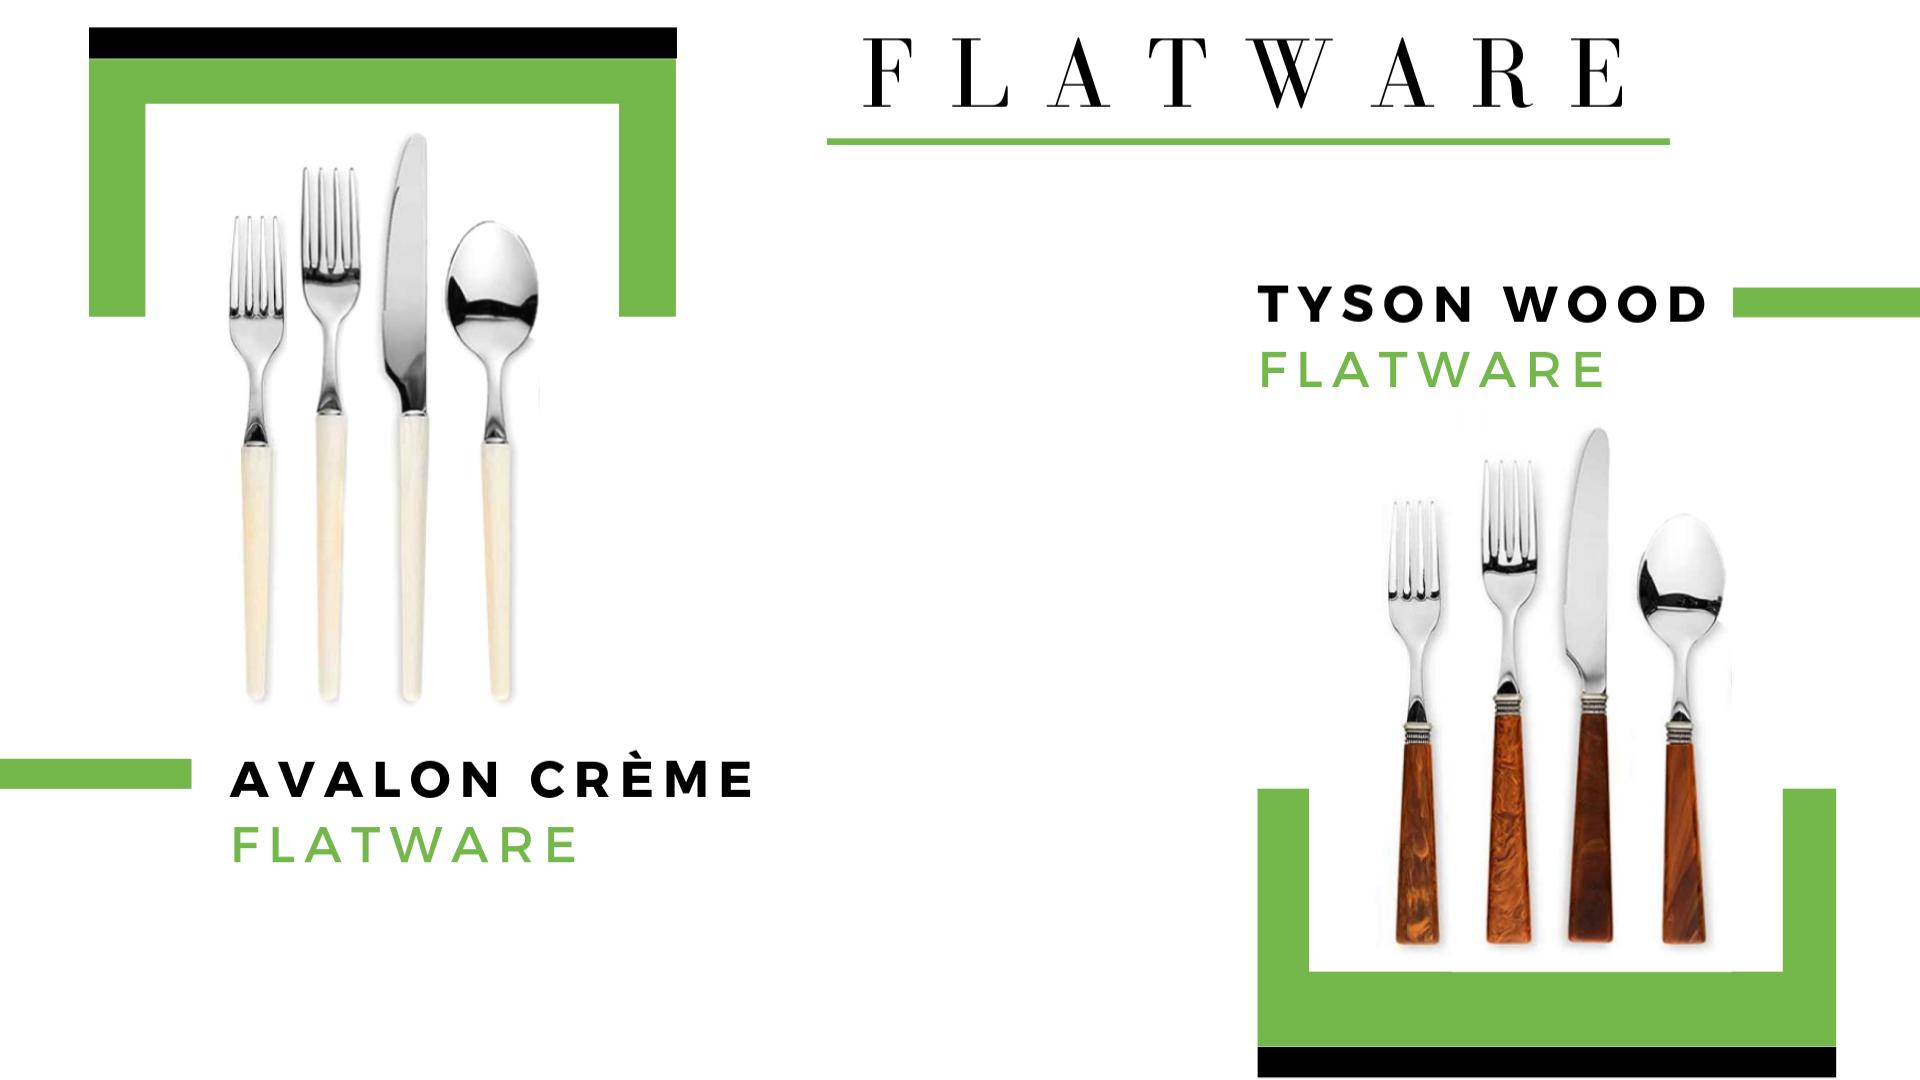 Avalon Creme + Tyson Wood Flatware